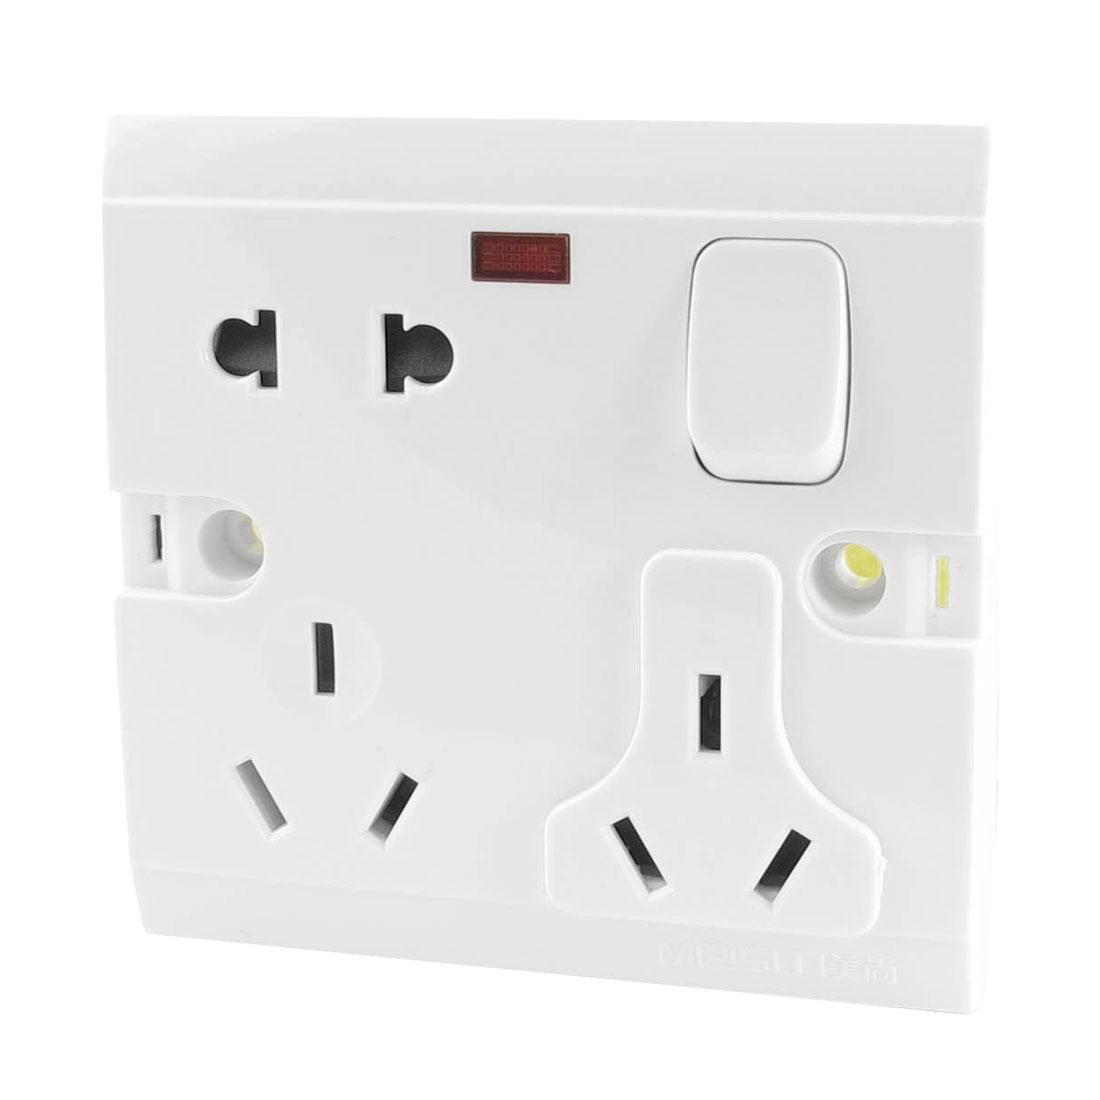 AC 250V 10A AU EU US Plug Socket Red Indicator Single Gang Wall Panel Switch